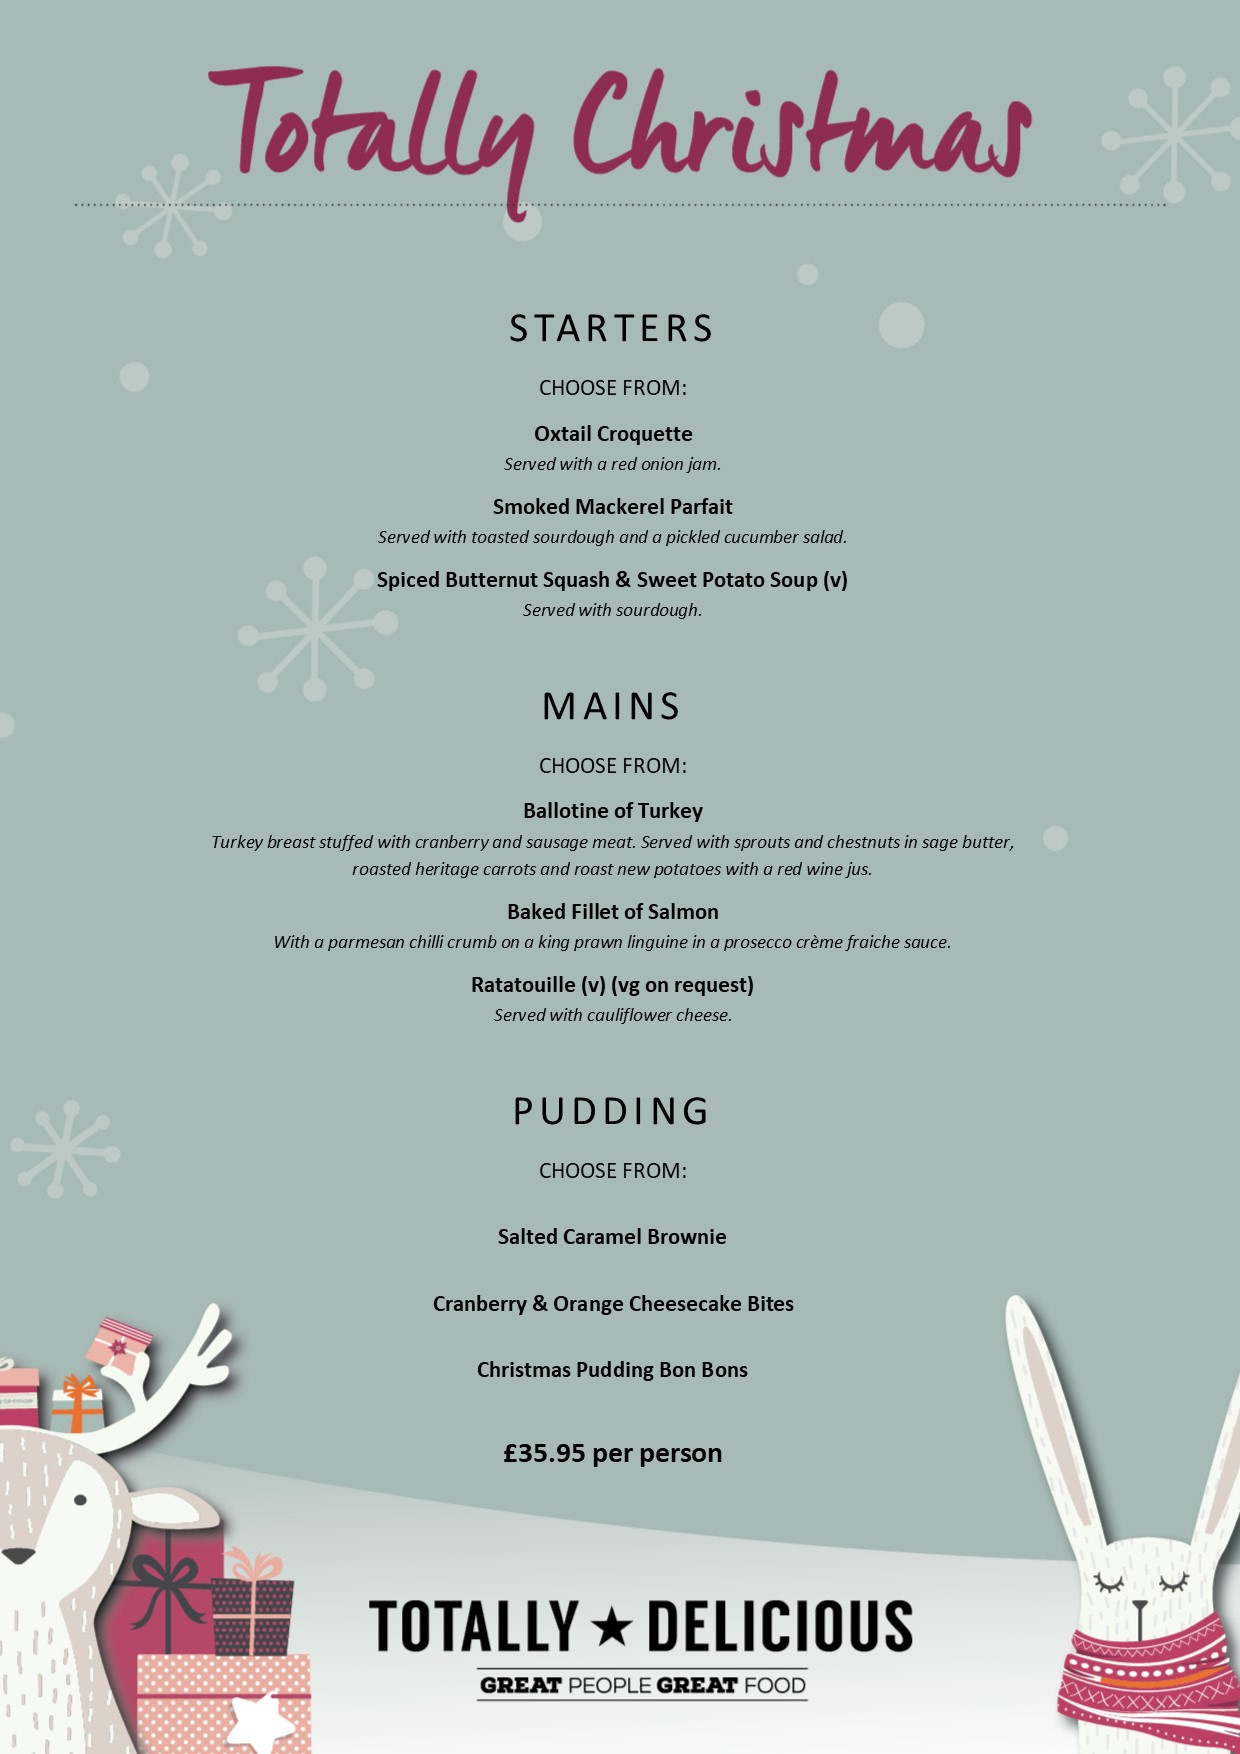 Totally Christmas - 3-course menu